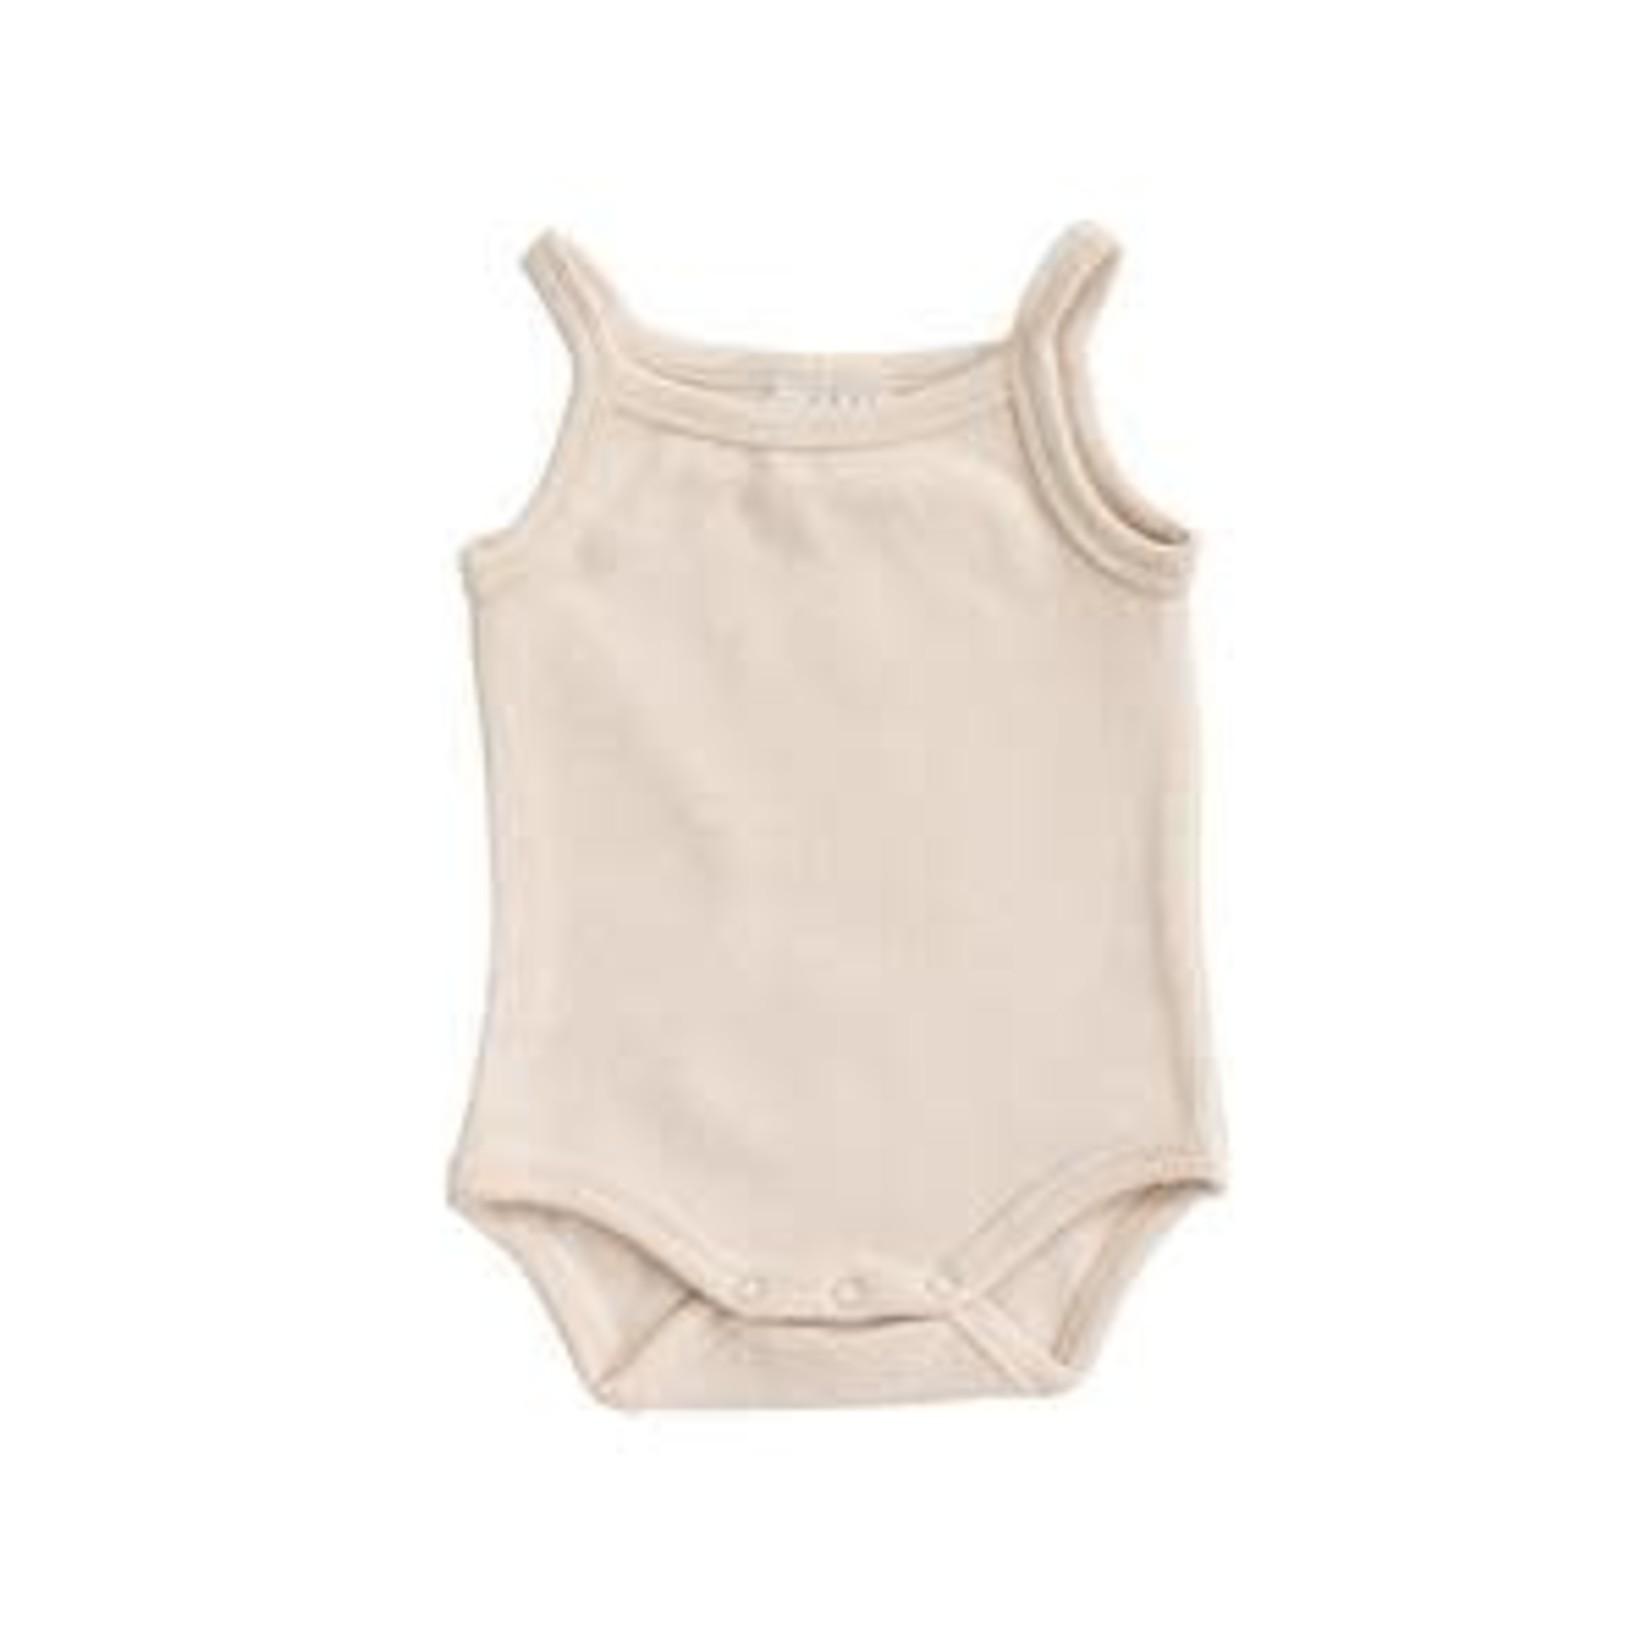 Mebie Baby Cream Tank Ribbed Bodysuit 0-3